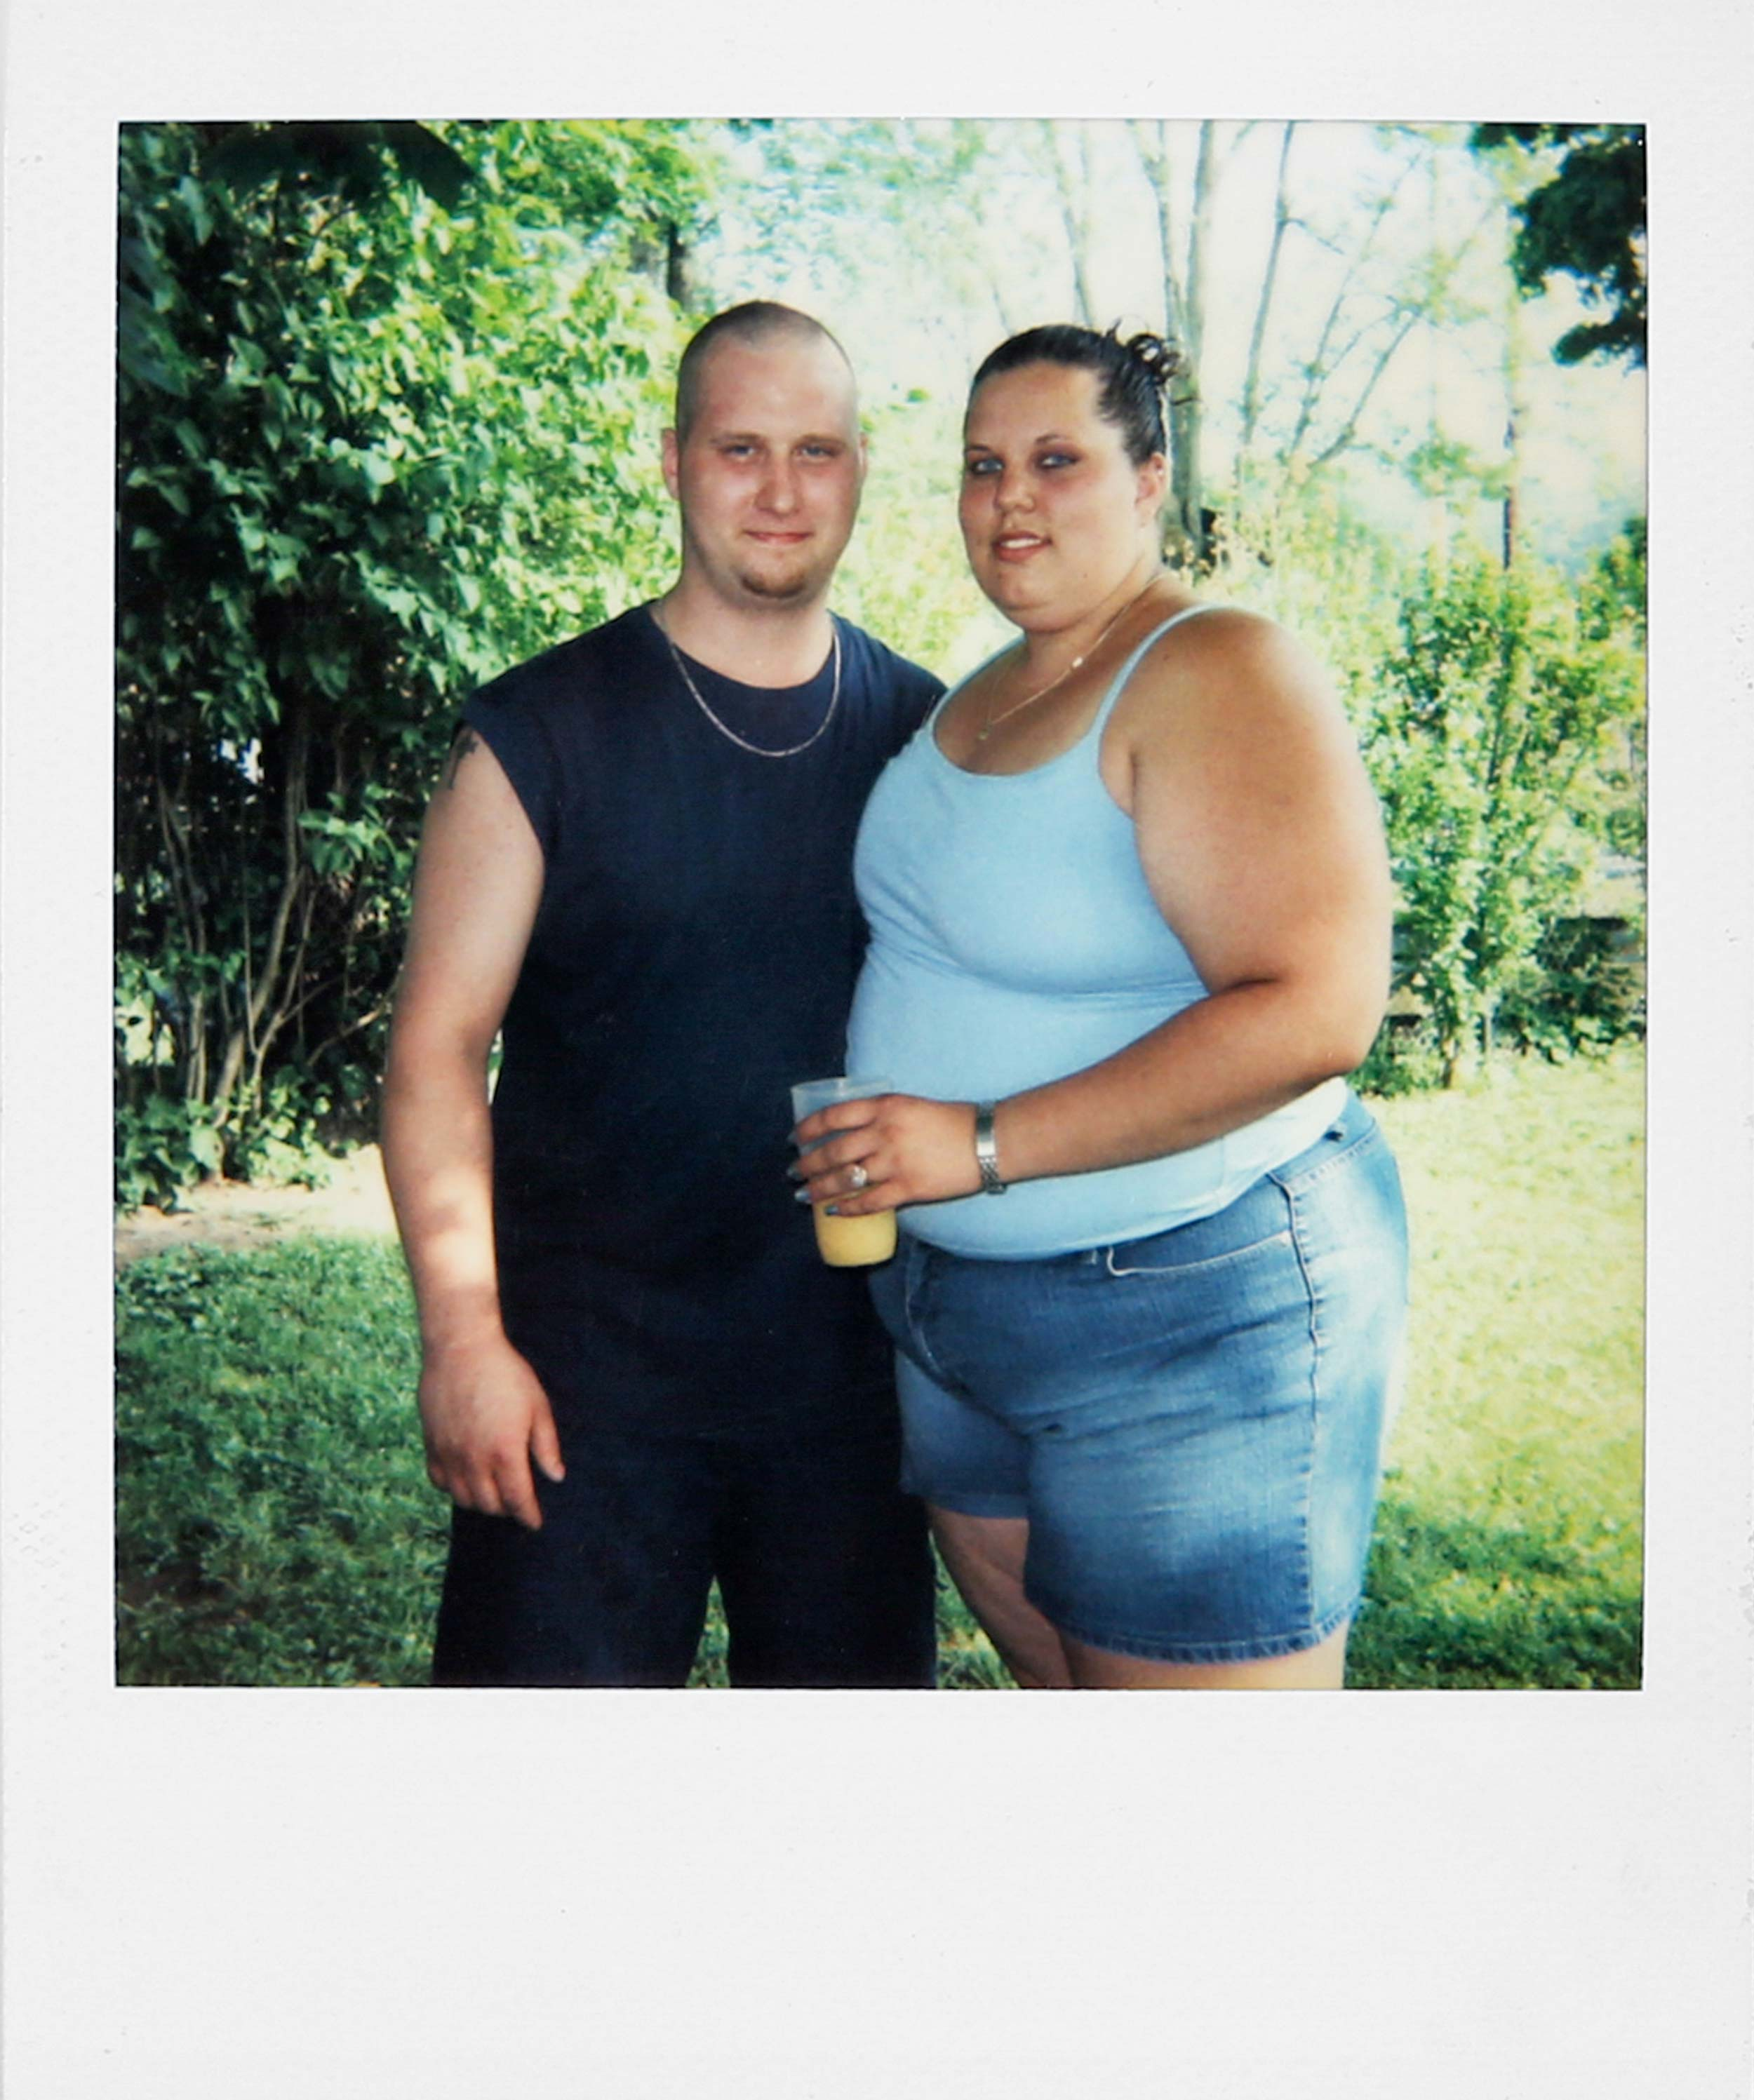 couple-2n-1T4A7557.jpg